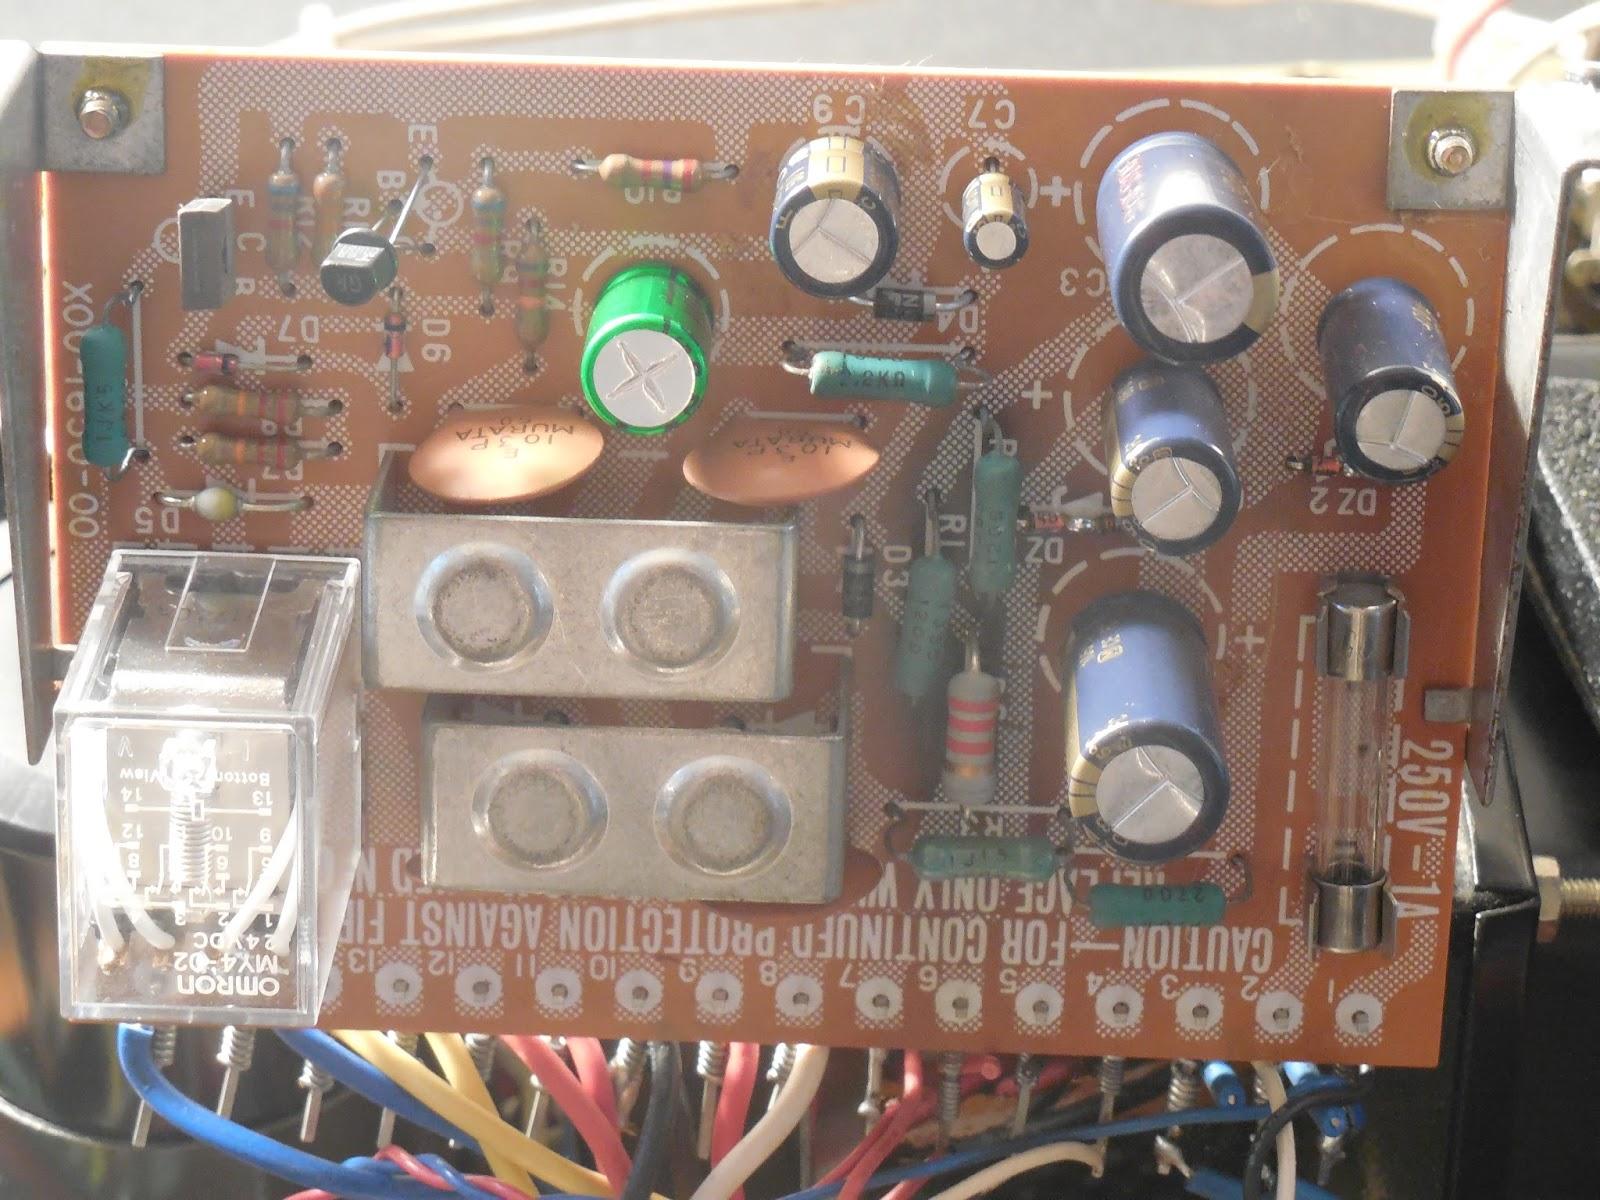 Ce2 Fuse Box Wiring Diagram. Fuse Box embly, Fuse Box Engine ... Ce Fuse Box Wiring Diagram on fuse box circuit, fuse box plug, fuse box speaker, 1964 thunderbird fuse box diagram, 1997 mercury mystique fuse box diagram, 05 ford explorer fuse diagram, jeep grand cherokee fuse box diagram, fuse box toyota, fuse box guide, fuse box schematic diagram, 2000 chevy cavalier fuse box diagram, fuse box transformer, boat fuel sending unit diagram, fuse box clock, fuse box engine, fuse box assembly, fuse box dimensions, 1989 ford bronco fuse box diagram, 2010 ford fusion fuse box diagram, gm fuse box diagram,